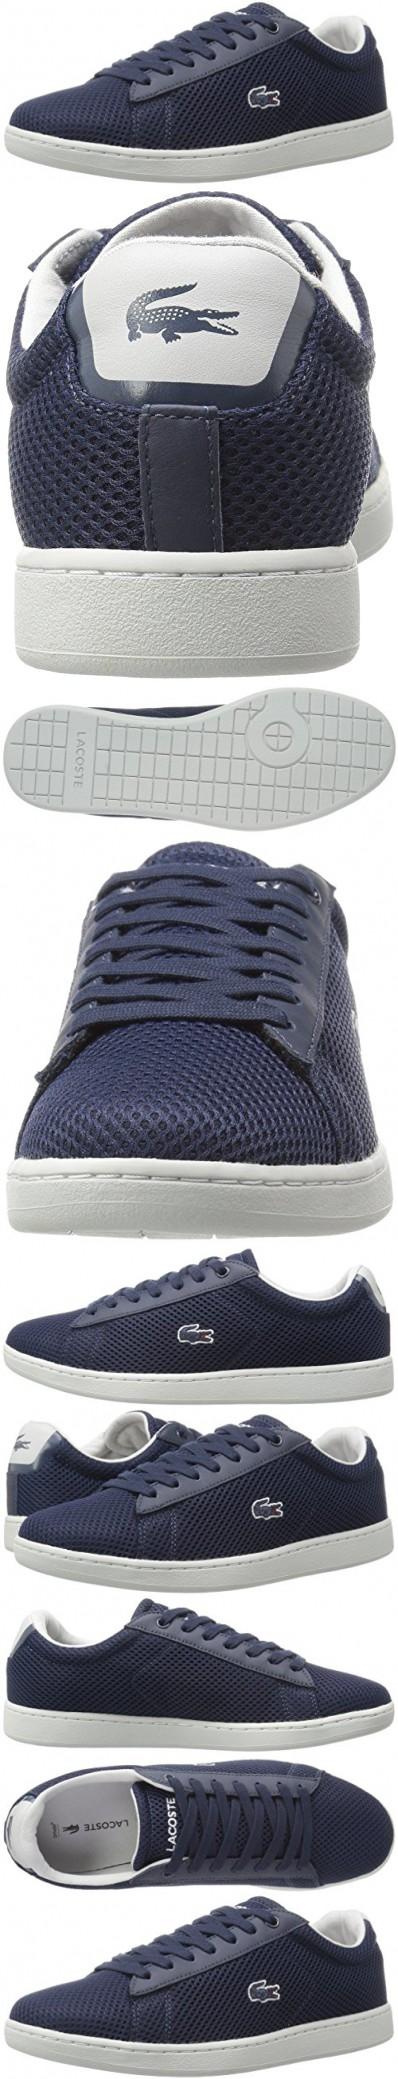 3c19d9fa85d9a Lacoste Women s Carnaby Evo 416 1 Spw Fashion Sneaker